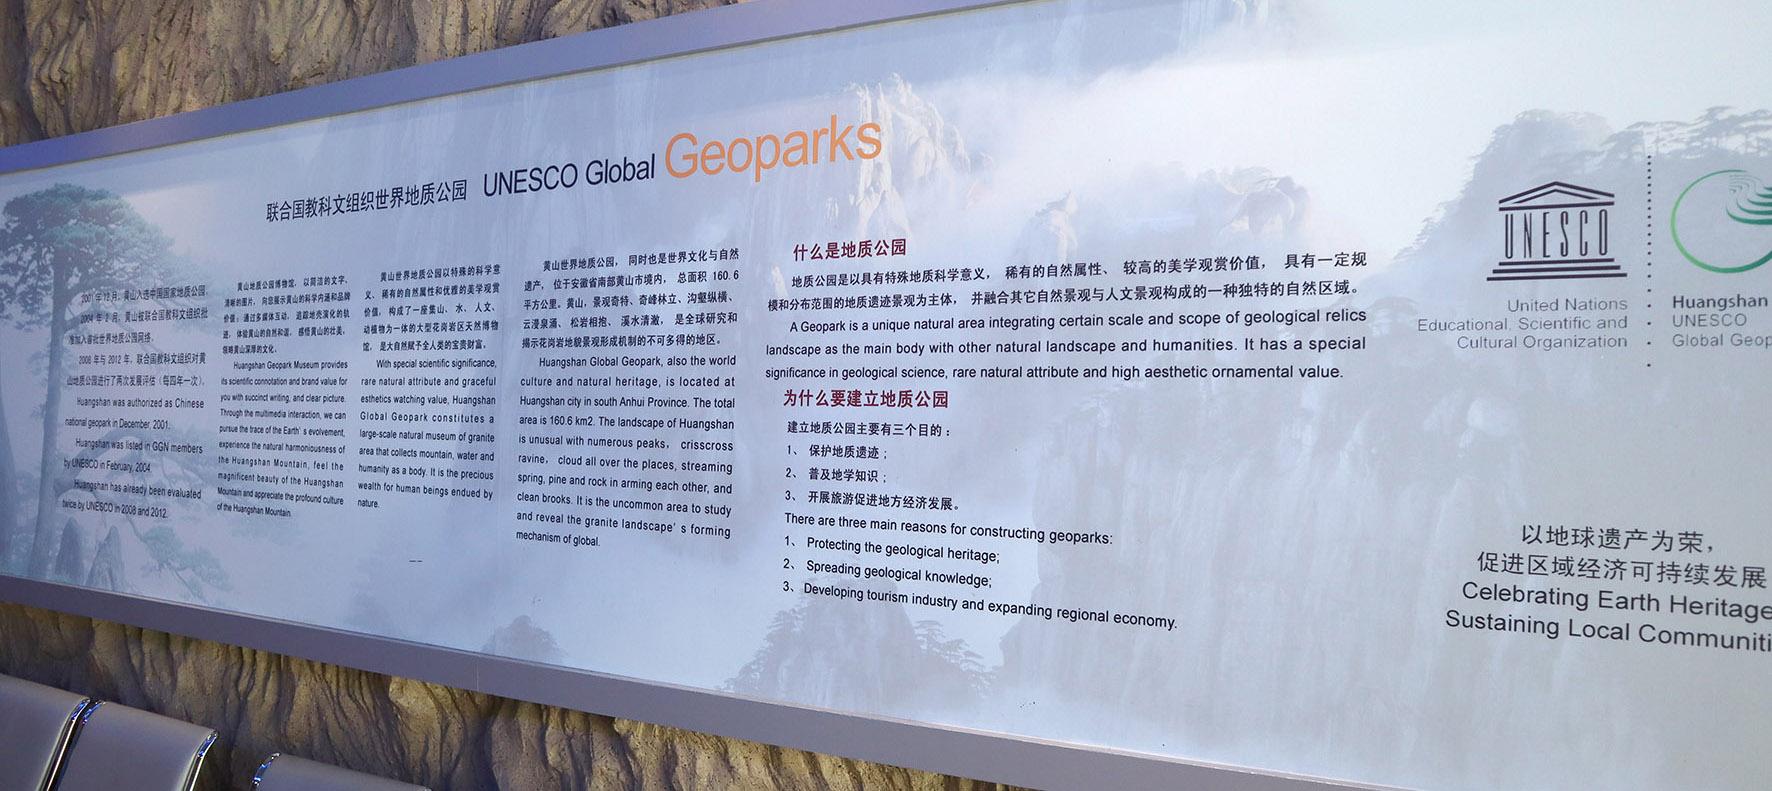 Besök i Anhui-provinsen, Kina – och utbyte med Huangshan Unesco Globala Geopark